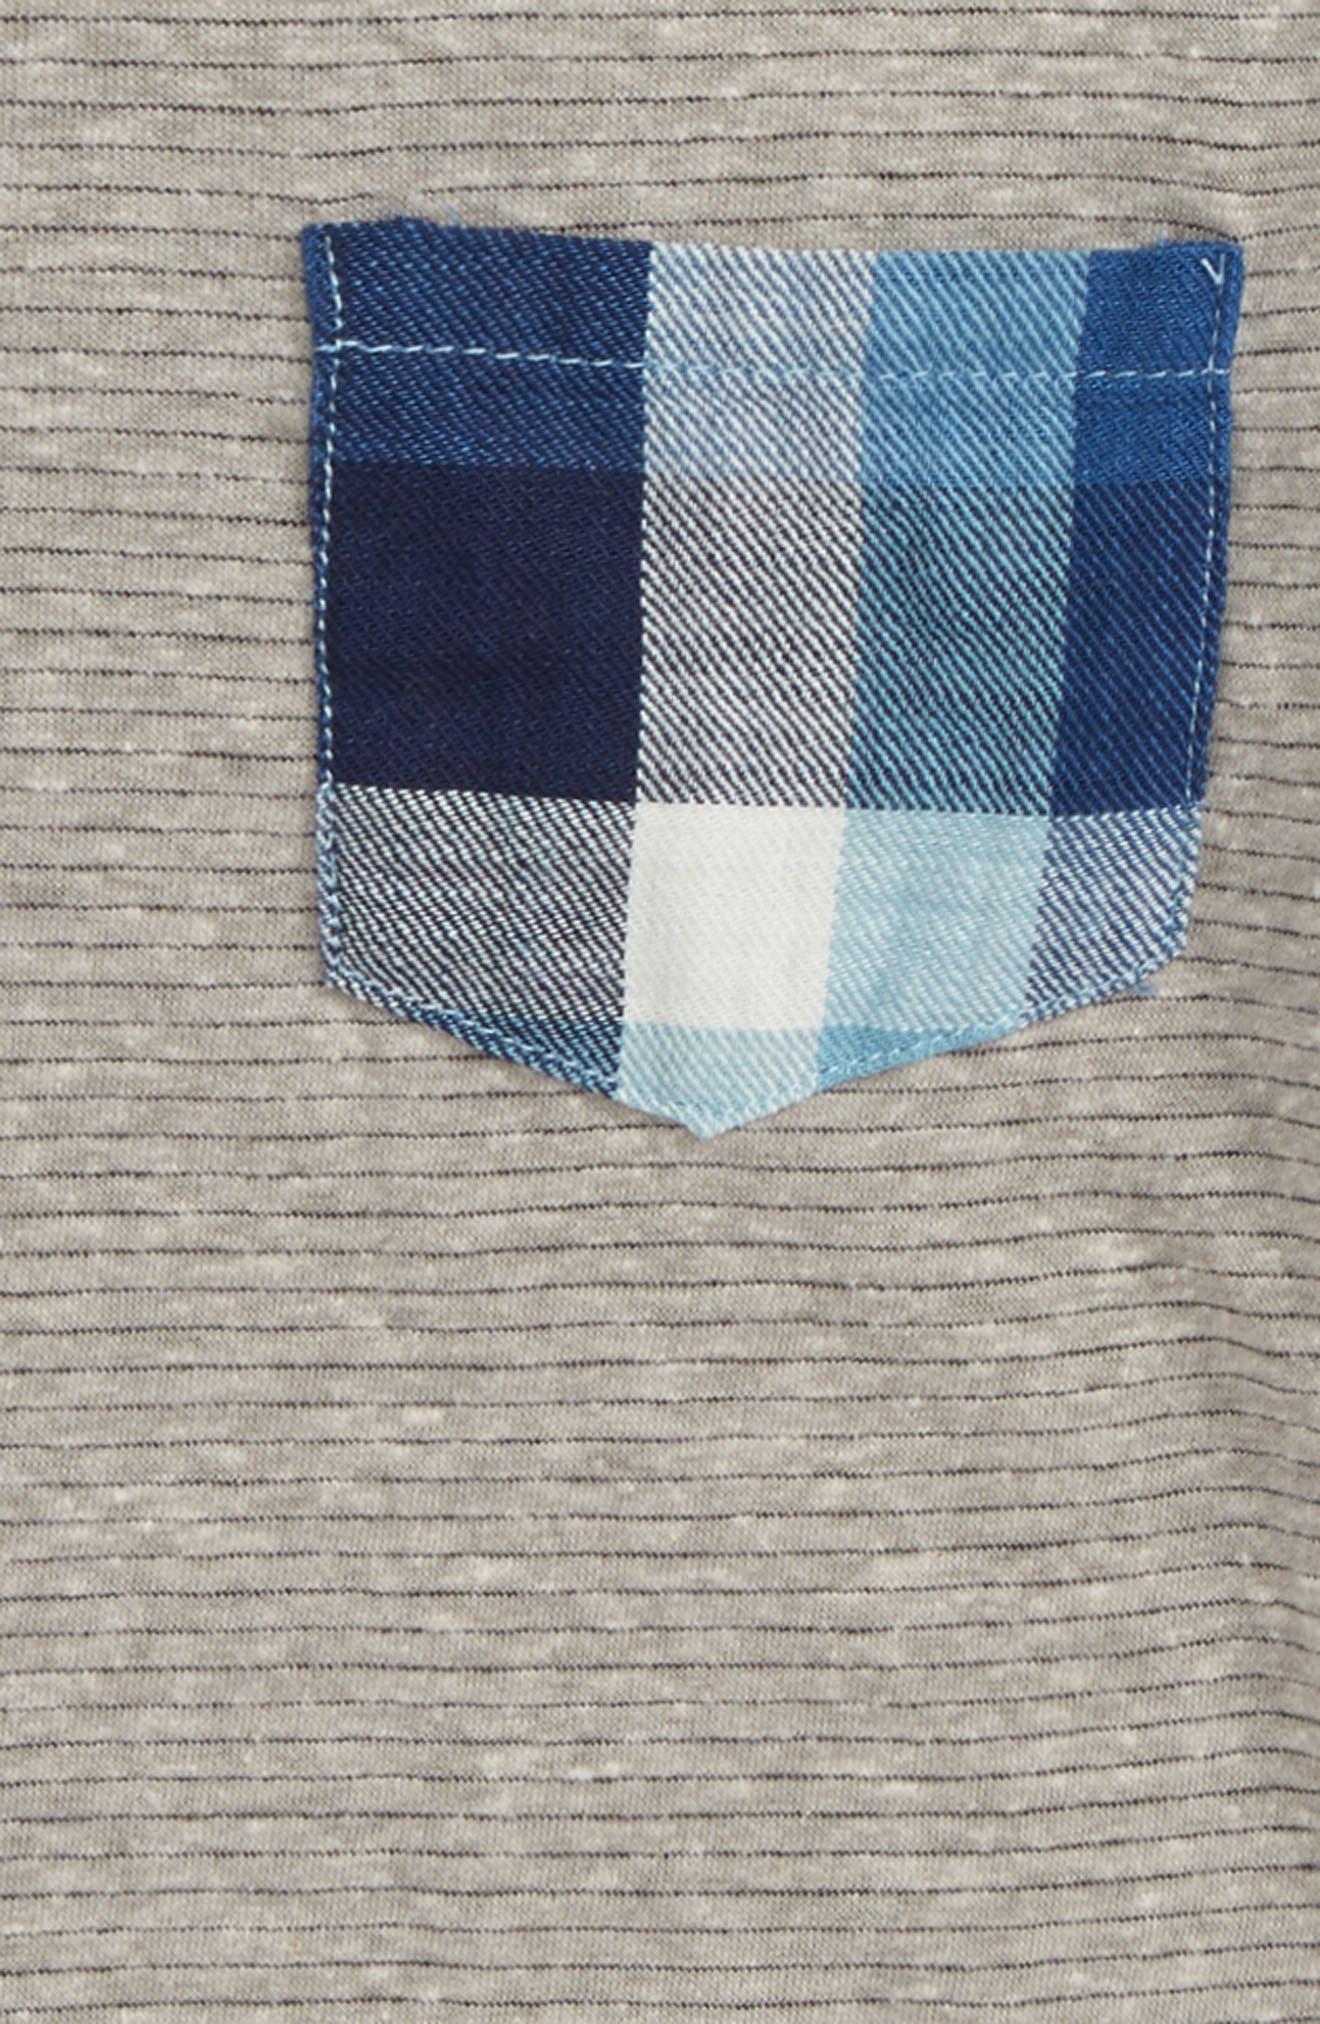 Ranger Pocket T-Shirt,                             Alternate thumbnail 2, color,                             La Jolla